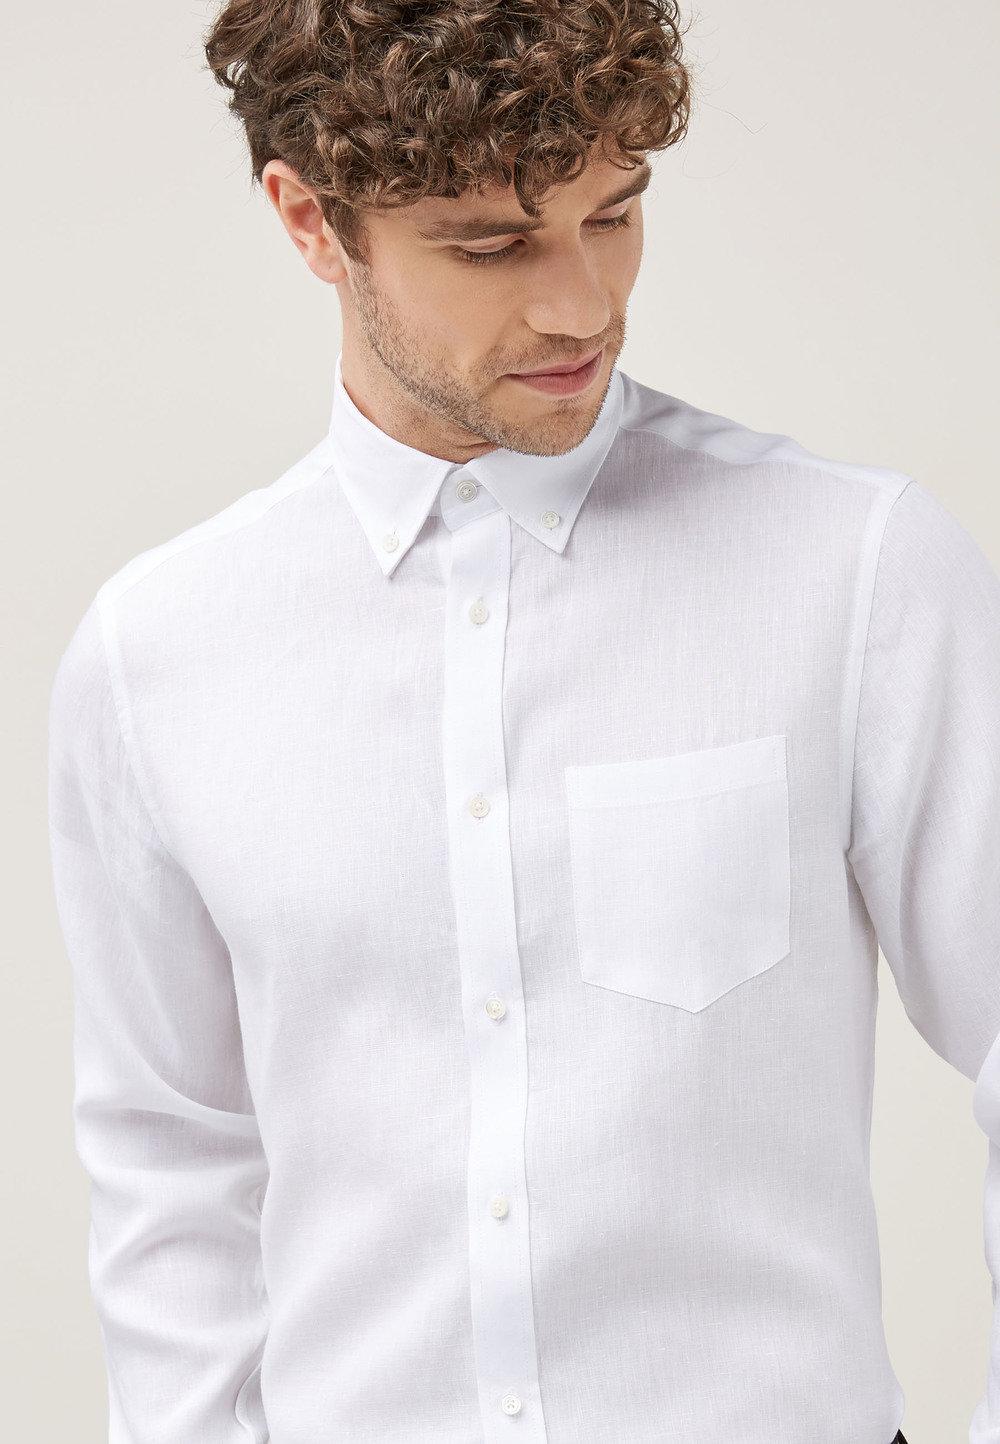 18bd272e8 Next Signature Linen Shirt - Regular Fit Single Cuff Online   Shop EziBuy